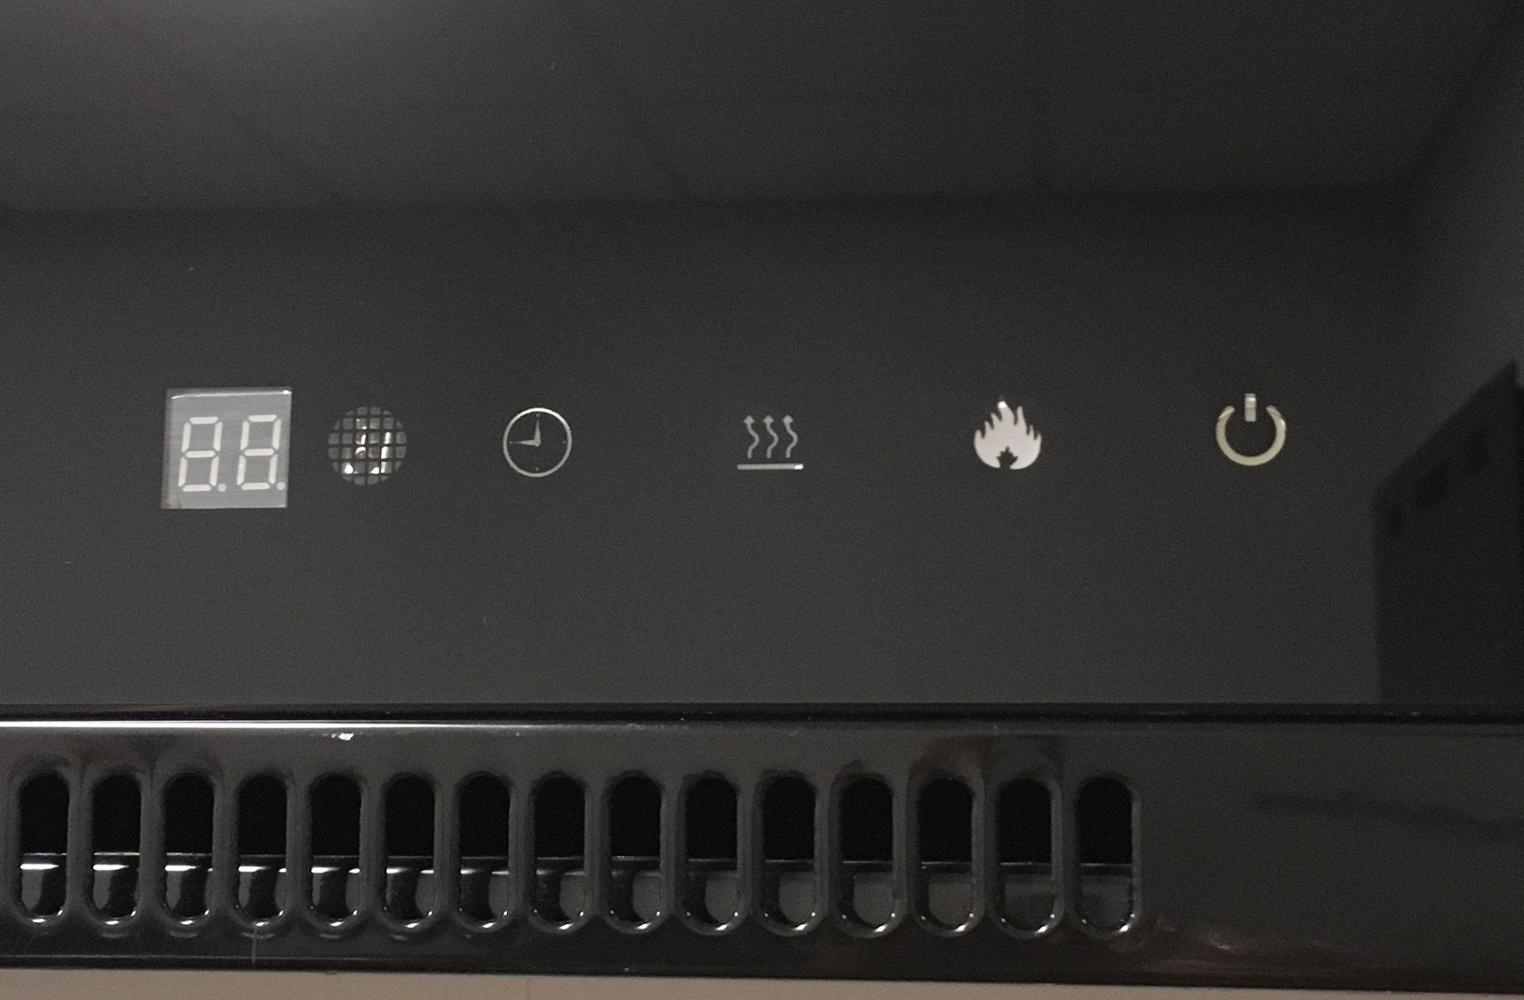 EF-WM363-controls-1524-x-1000-300-DPI